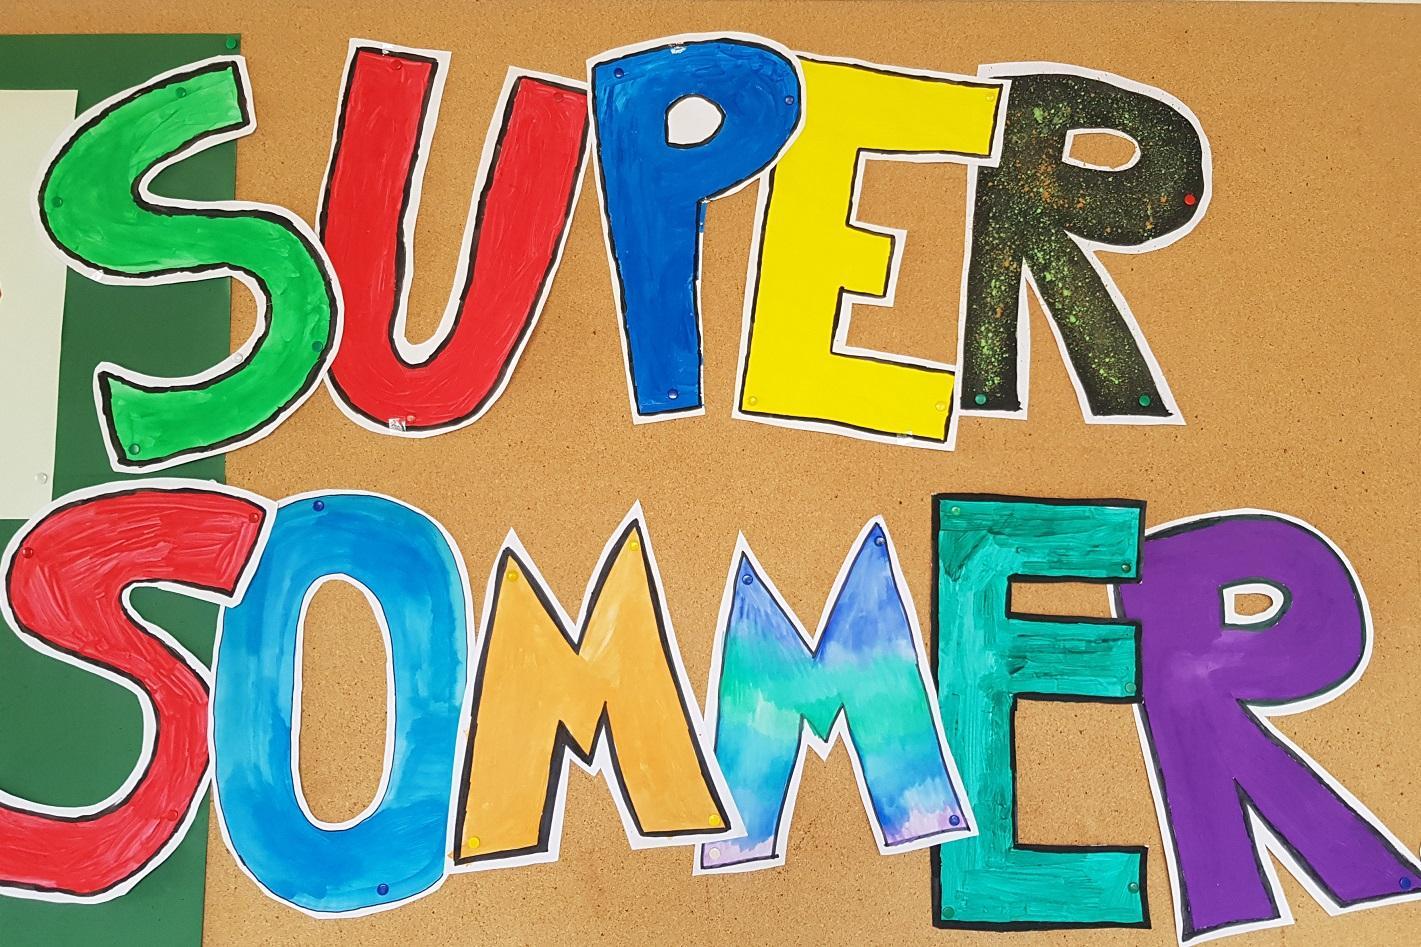 Super Sommer